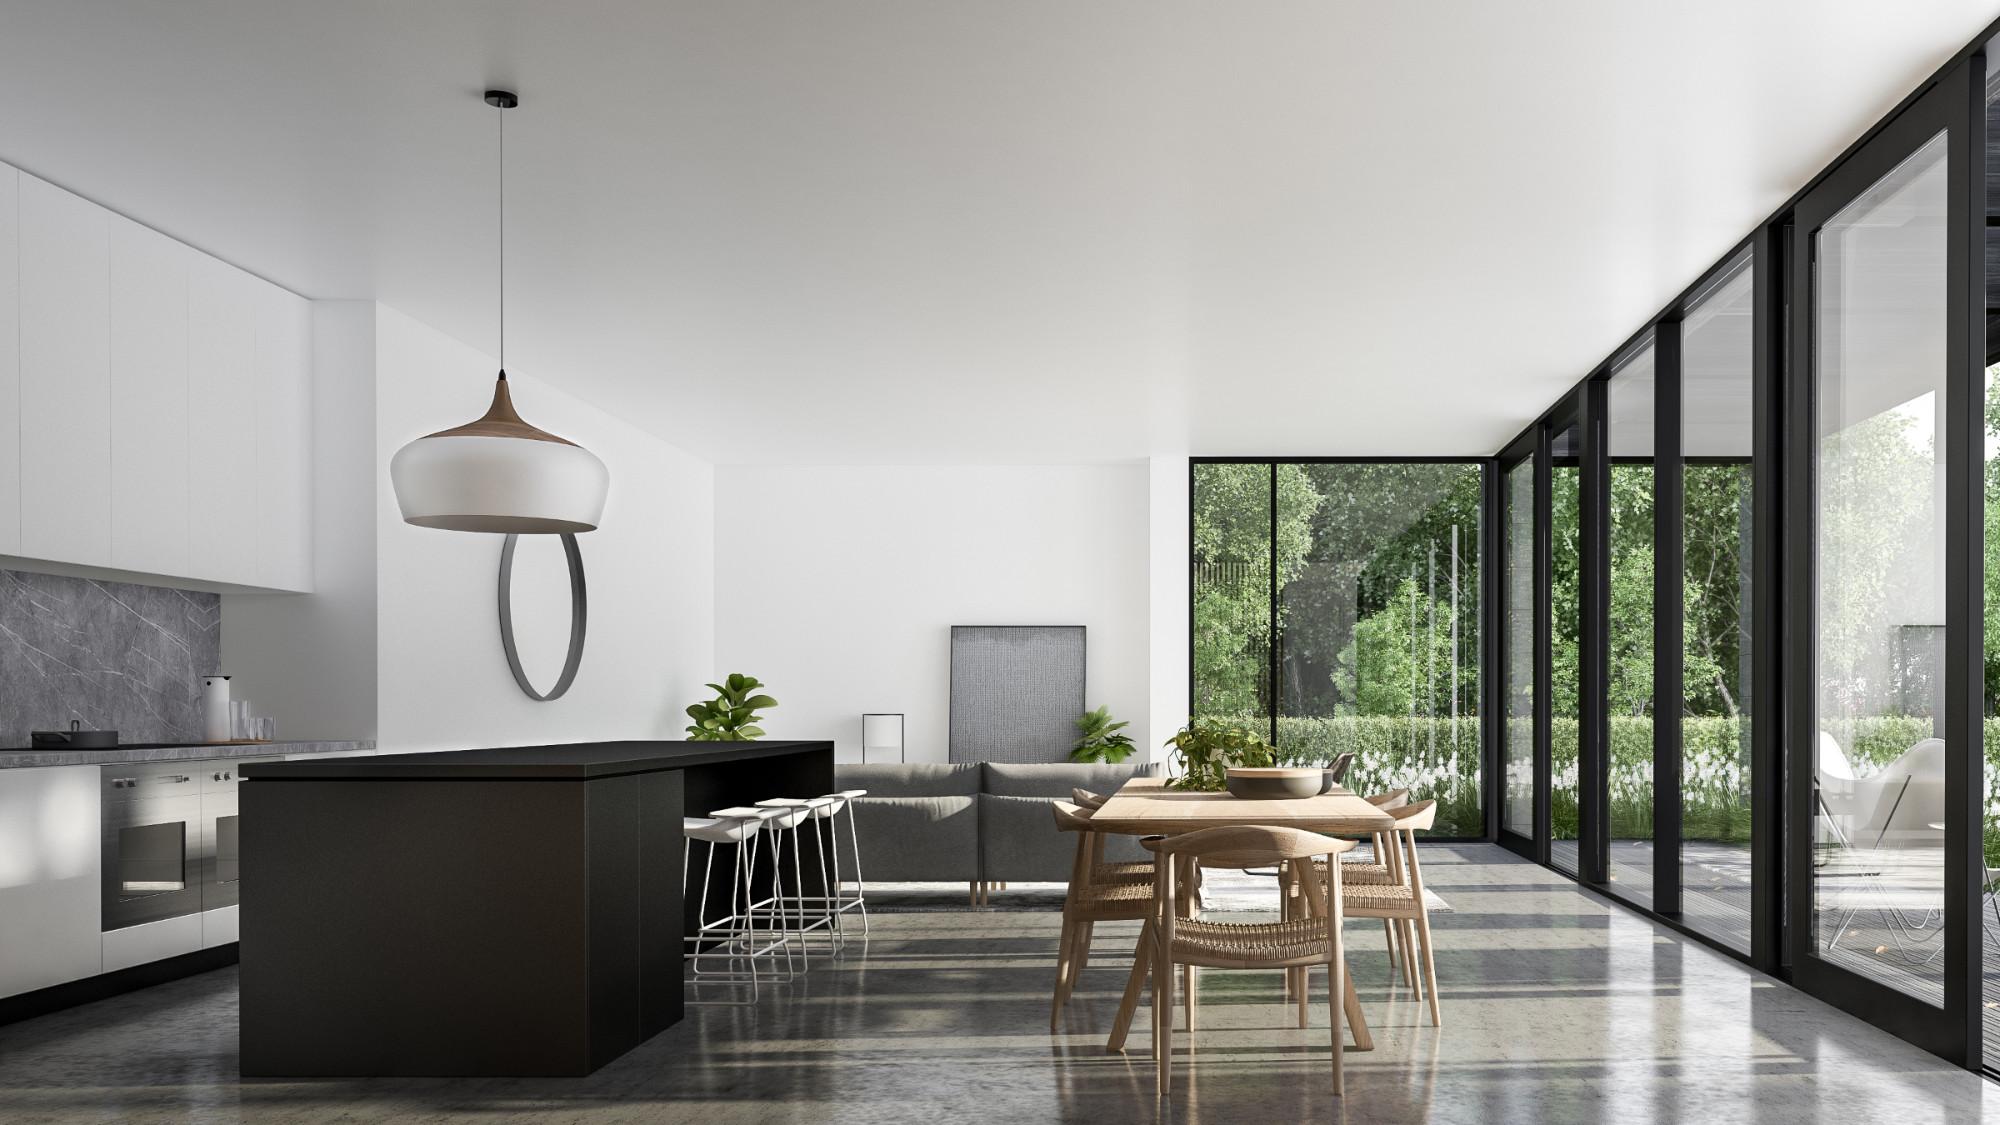 Lifespaces Group Bluestone House kitchen.jpg